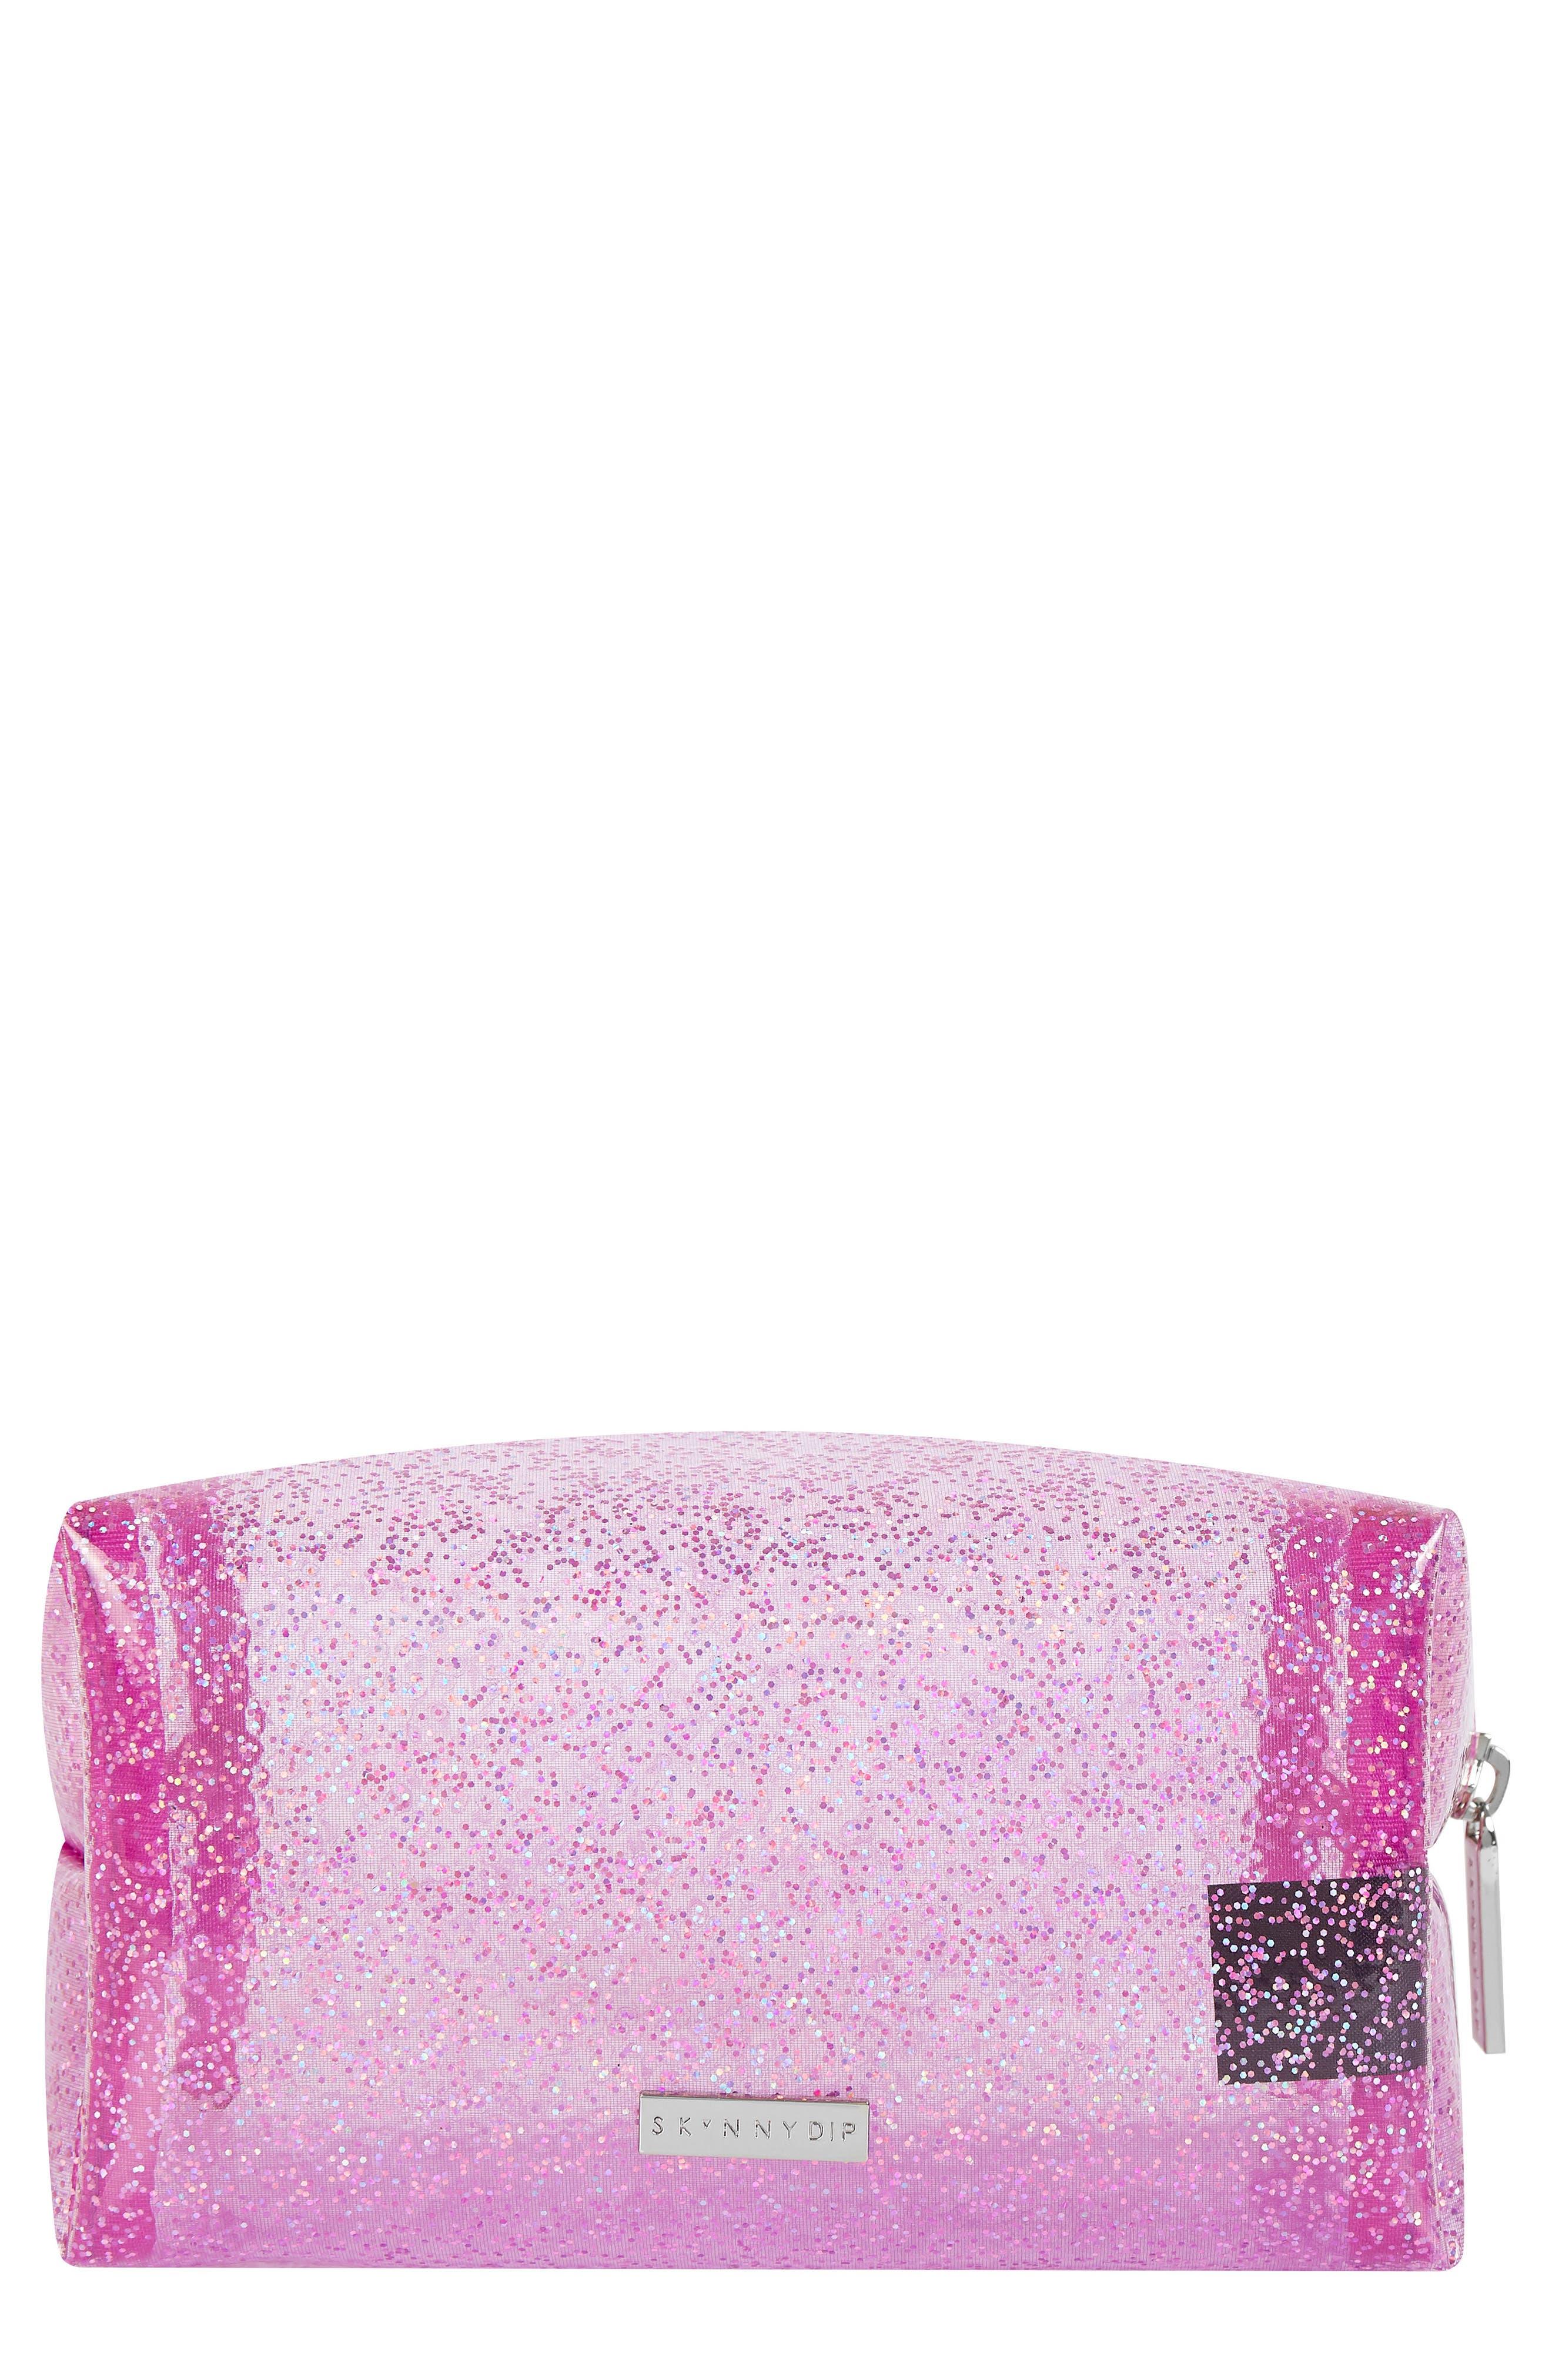 Glitter Bomb Makeup Bag,                             Main thumbnail 1, color,                             000